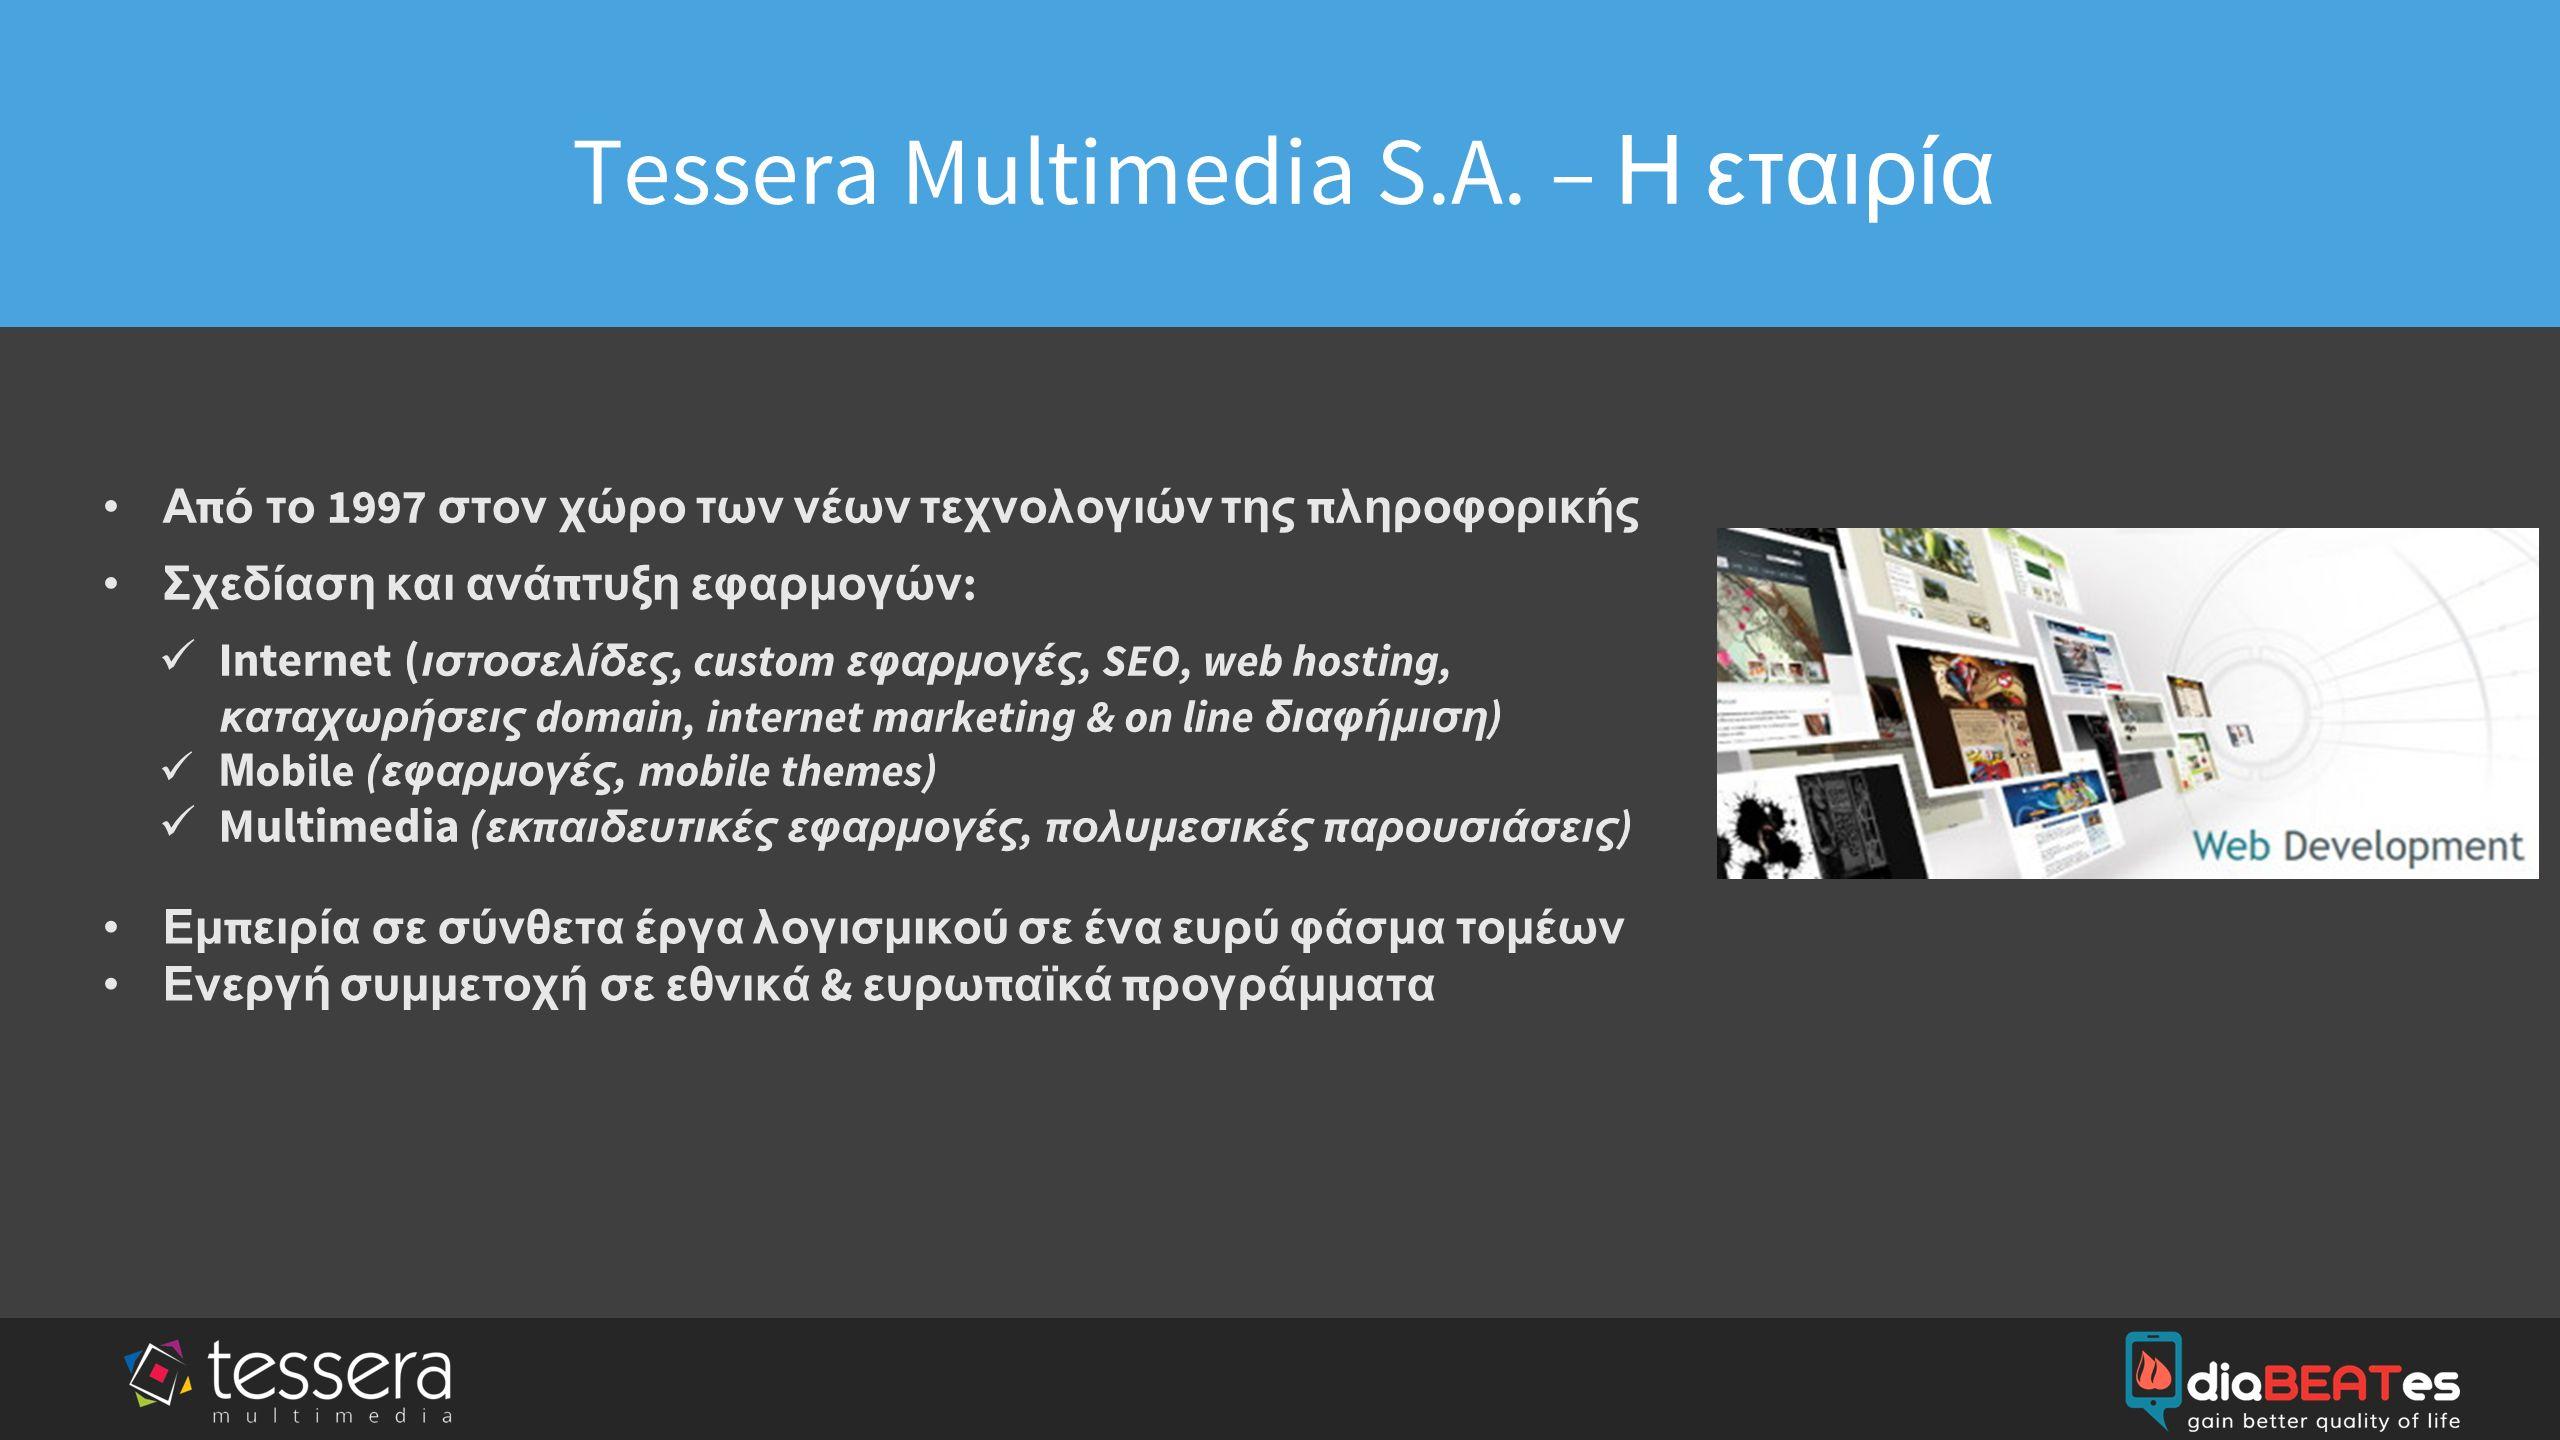 company logo & name Tessera Multimedia S.A.